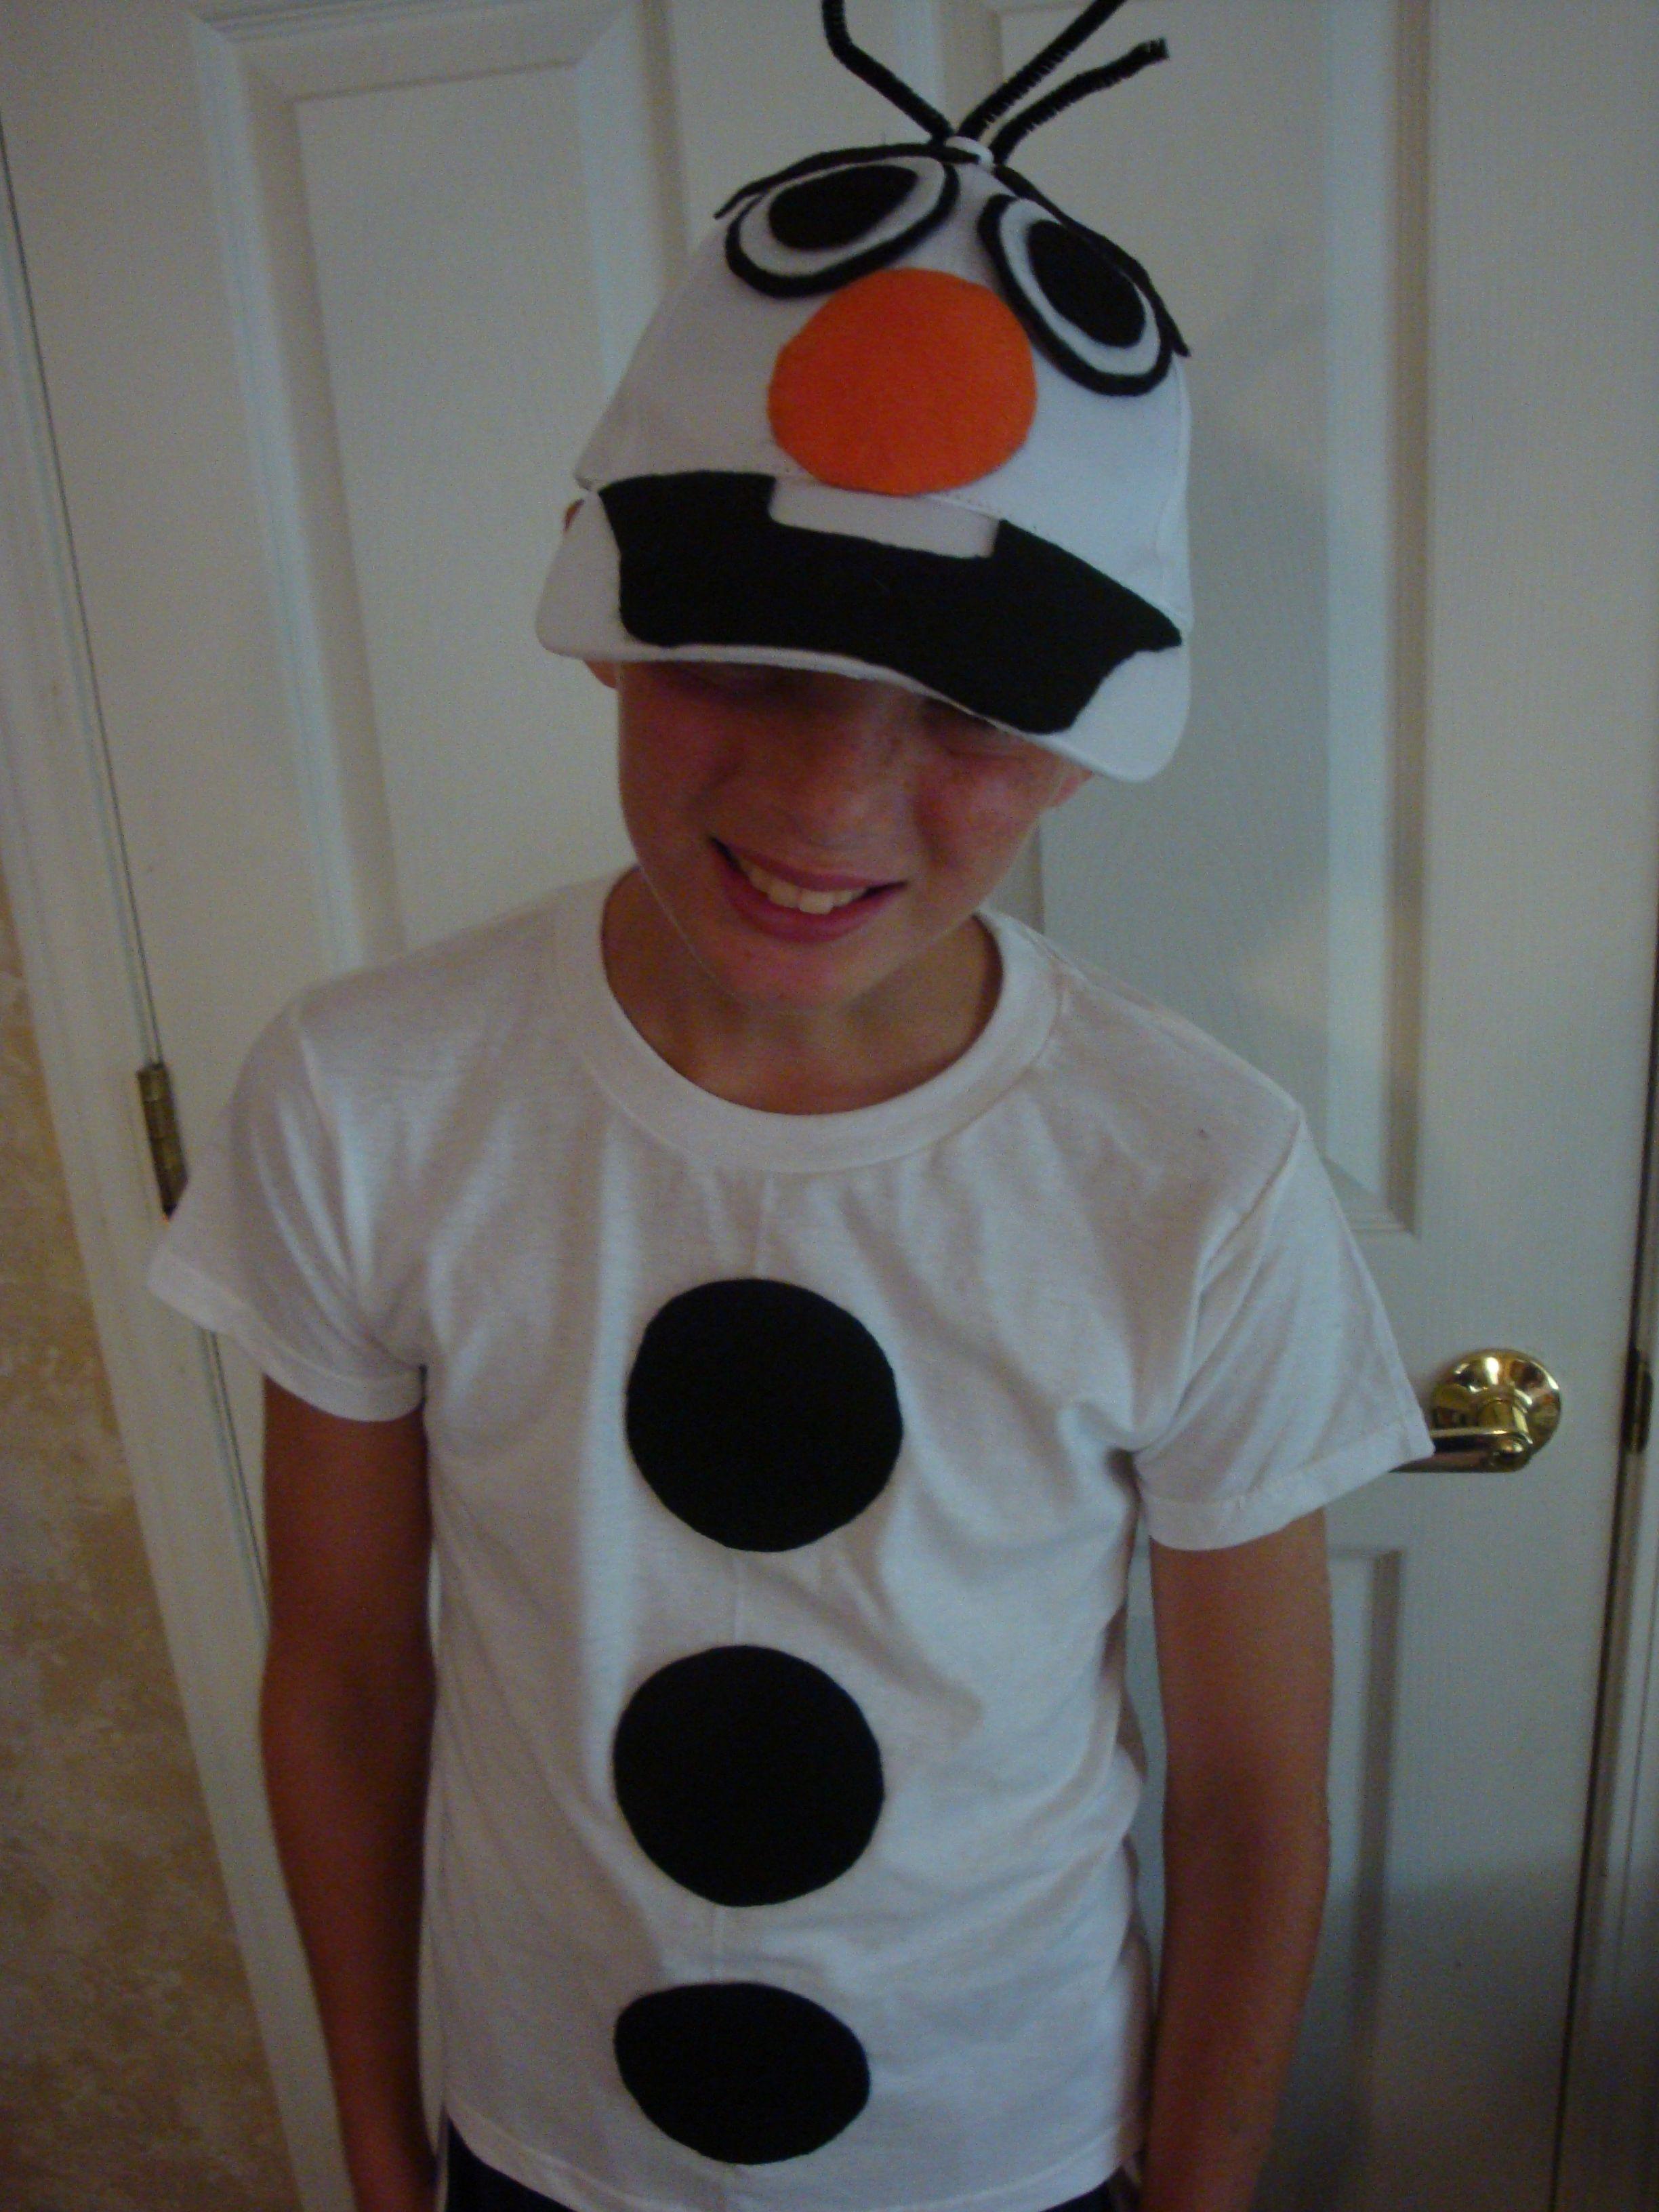 Olaf the snowman halloween costume diy handmade do it yourself olaf olaf the snowman halloween costume diy handmade do it yourself olaf halloween costume solutioingenieria Gallery